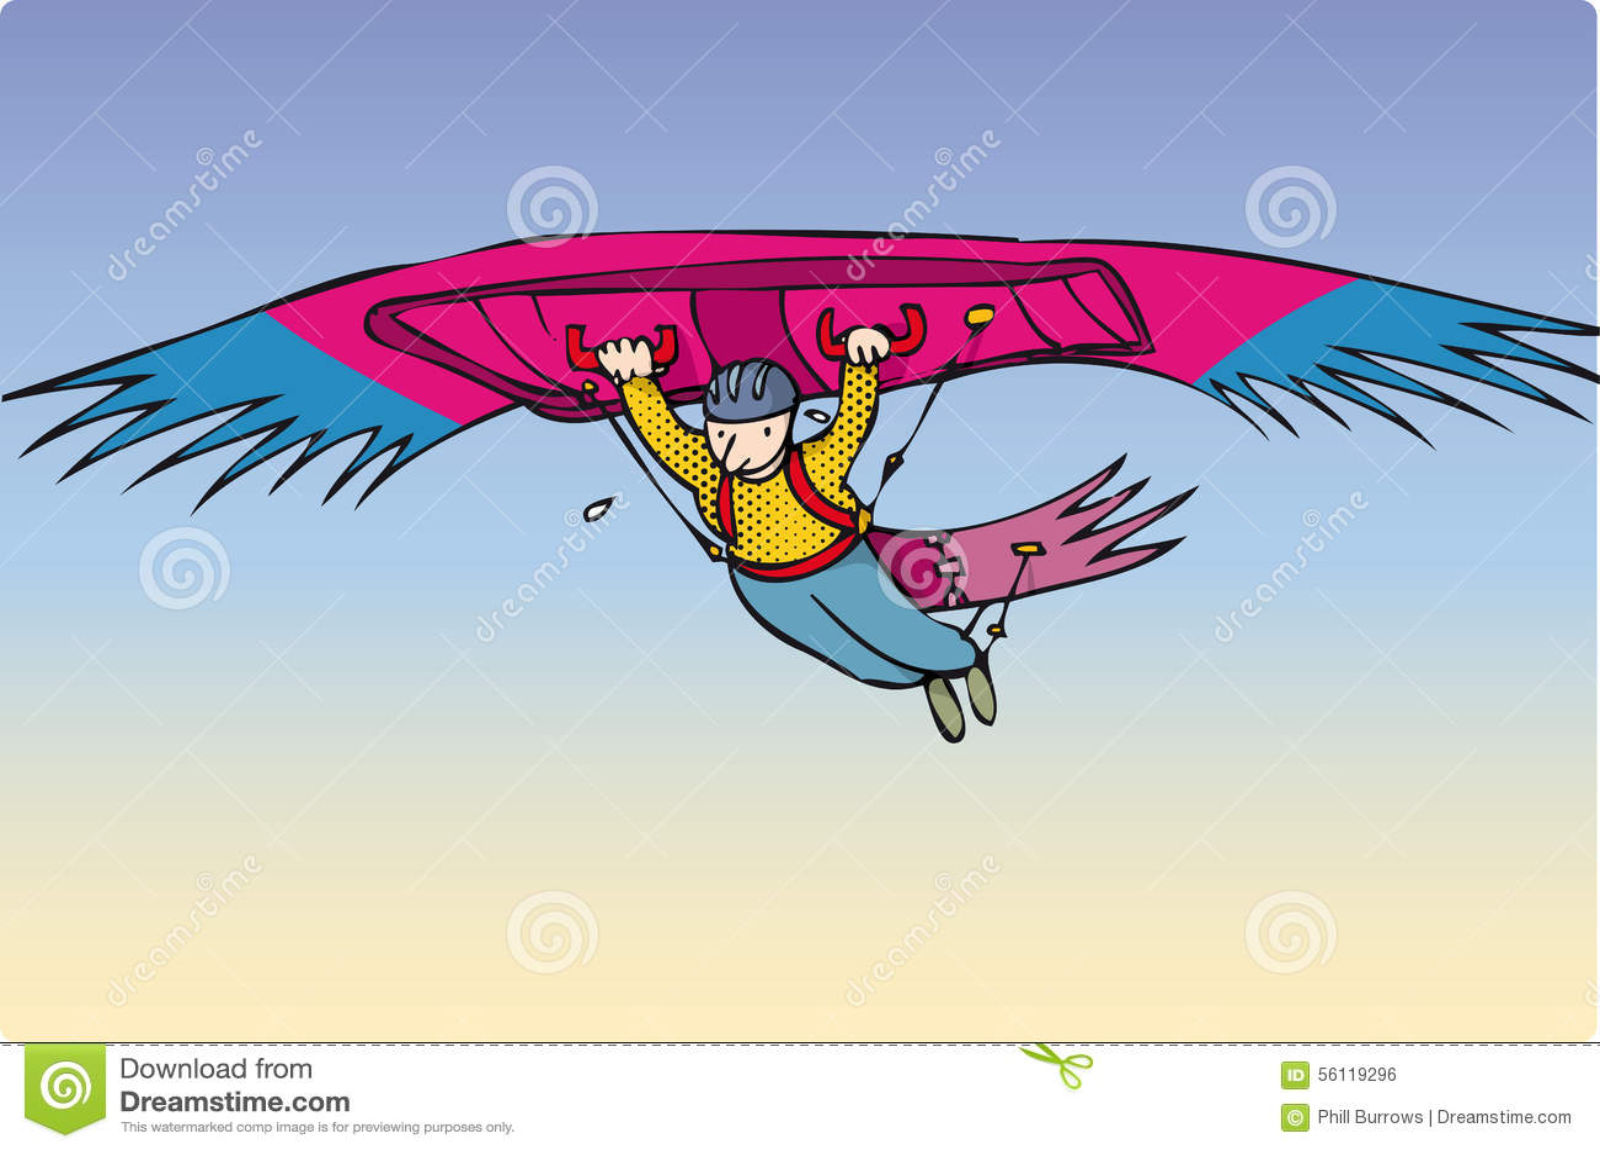 Zonderling zweefvliegtuig